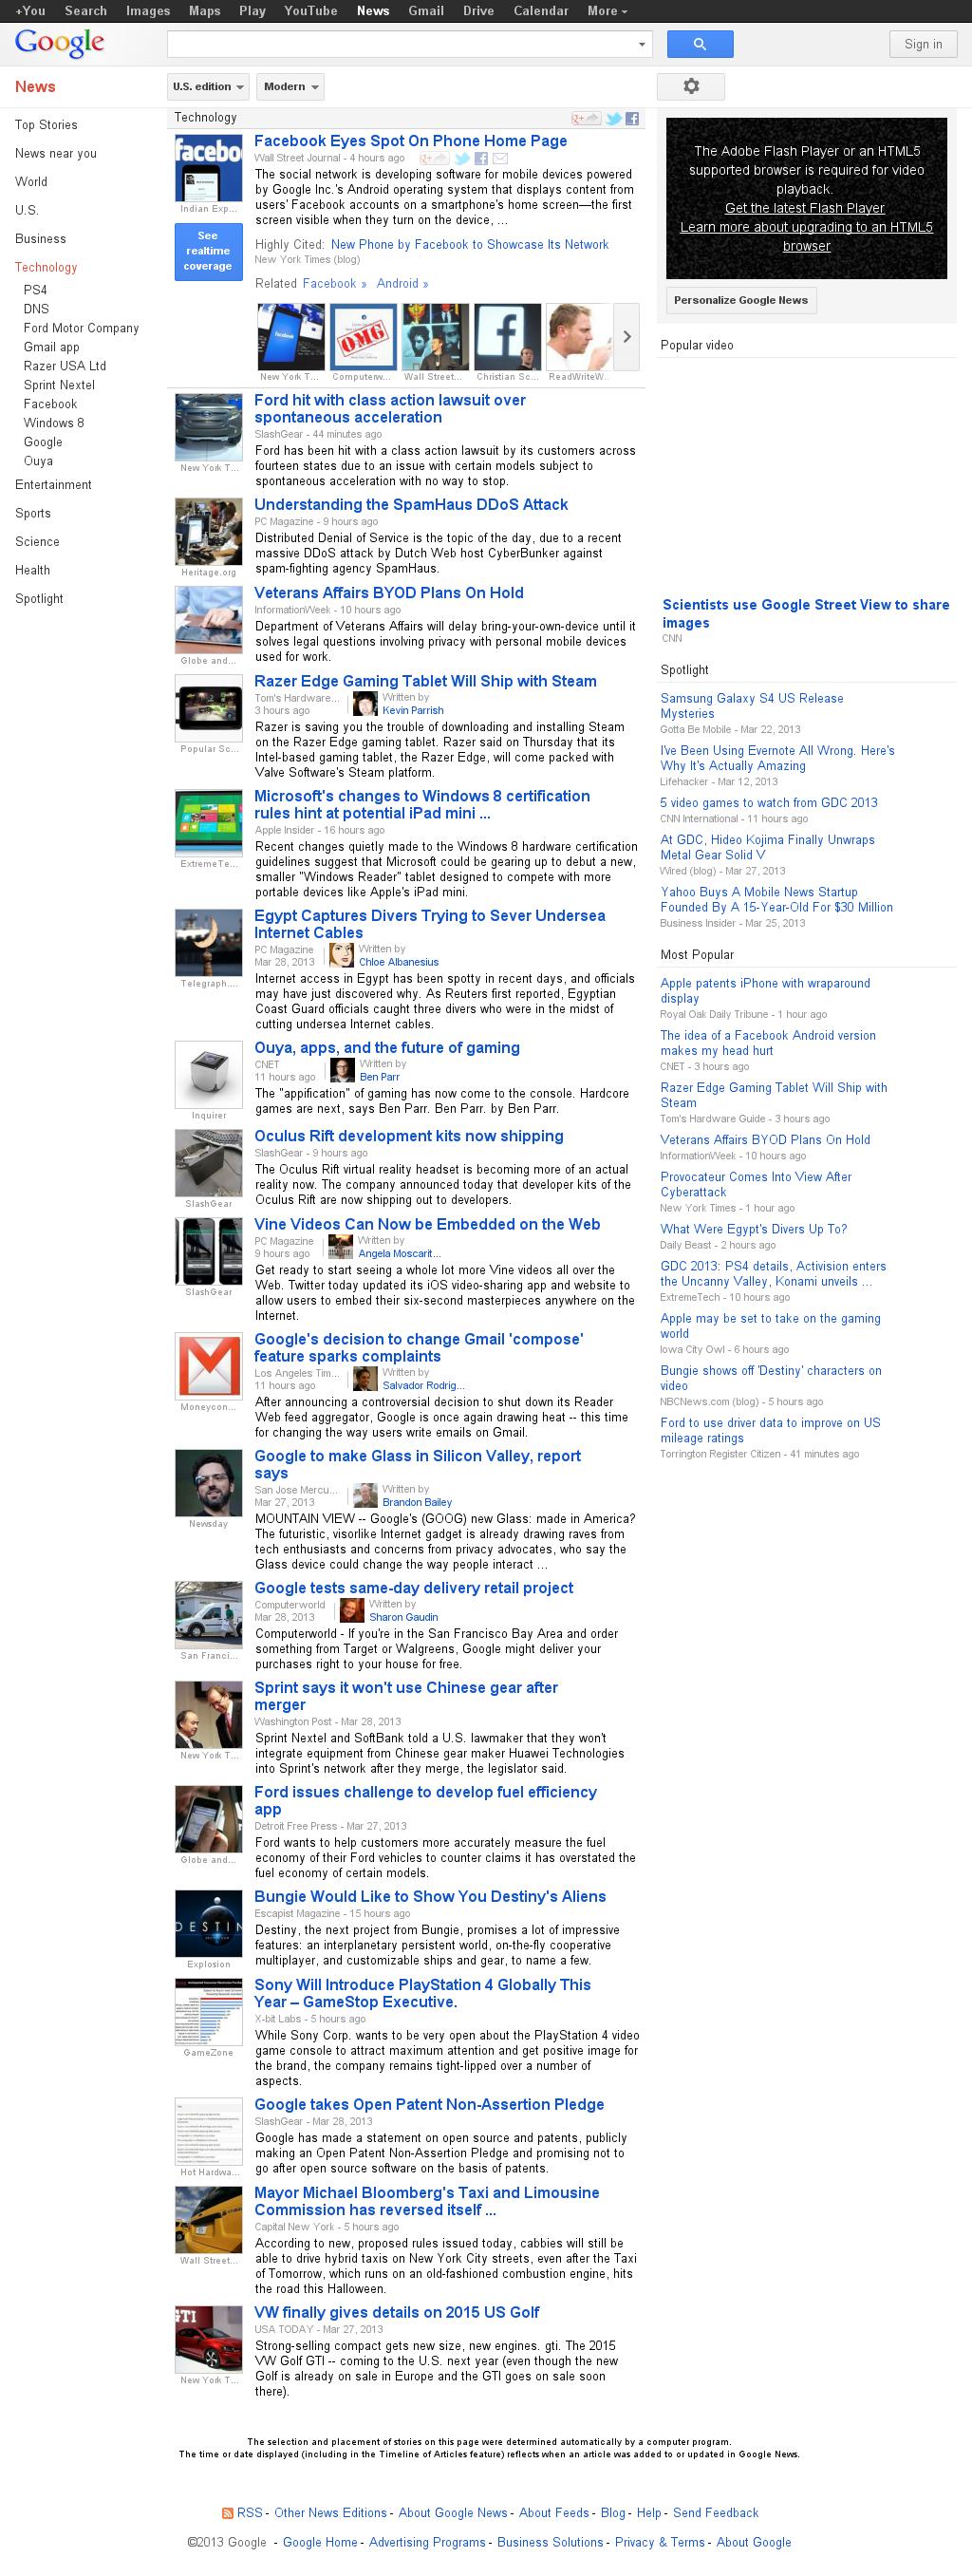 Google News: Technology at Saturday March 30, 2013, 5:13 a.m. UTC